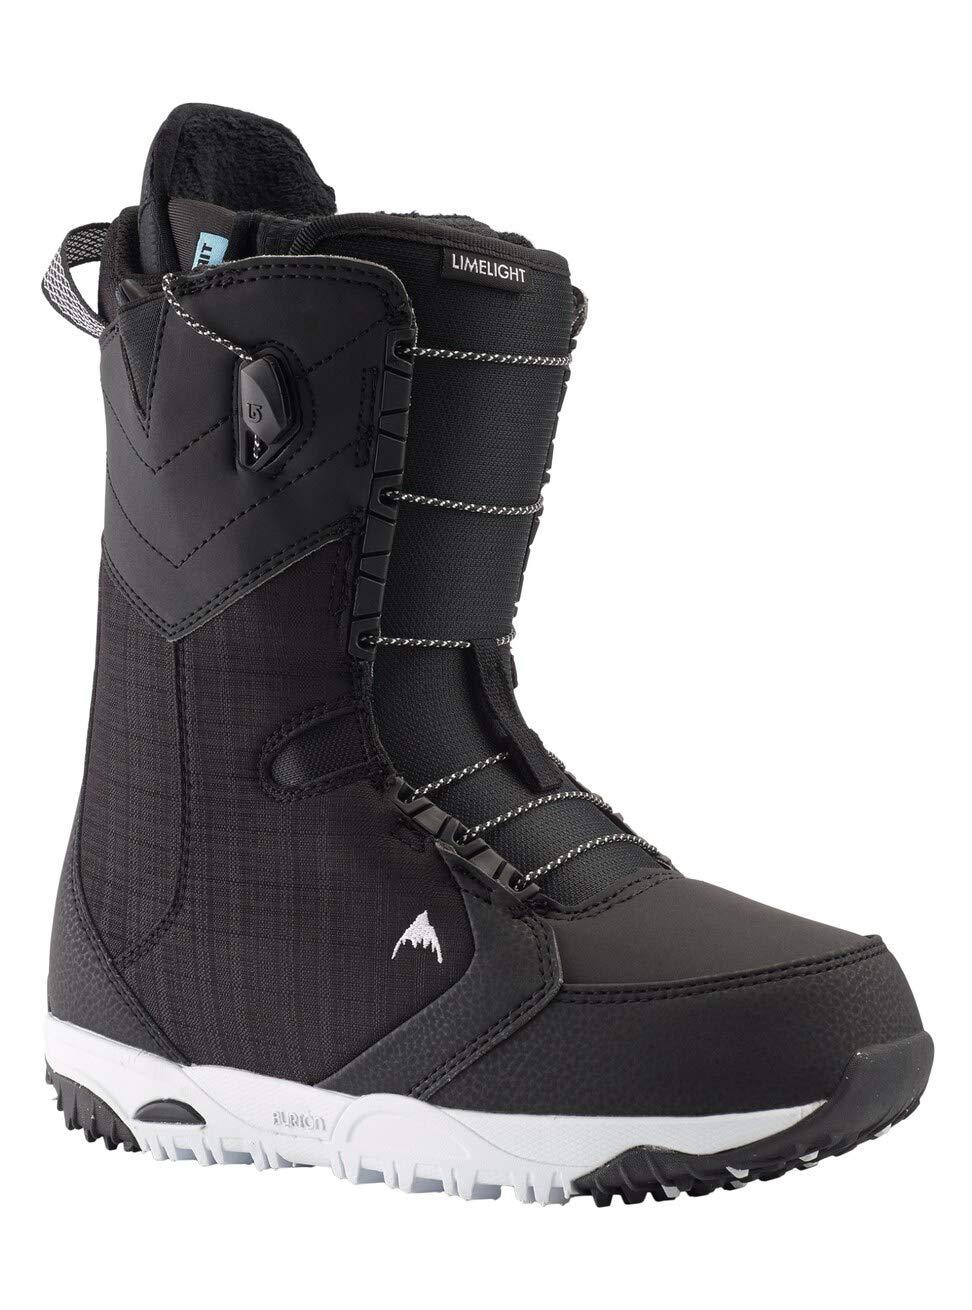 Burton Damen Limelight Snowboard Boot, Black, 10